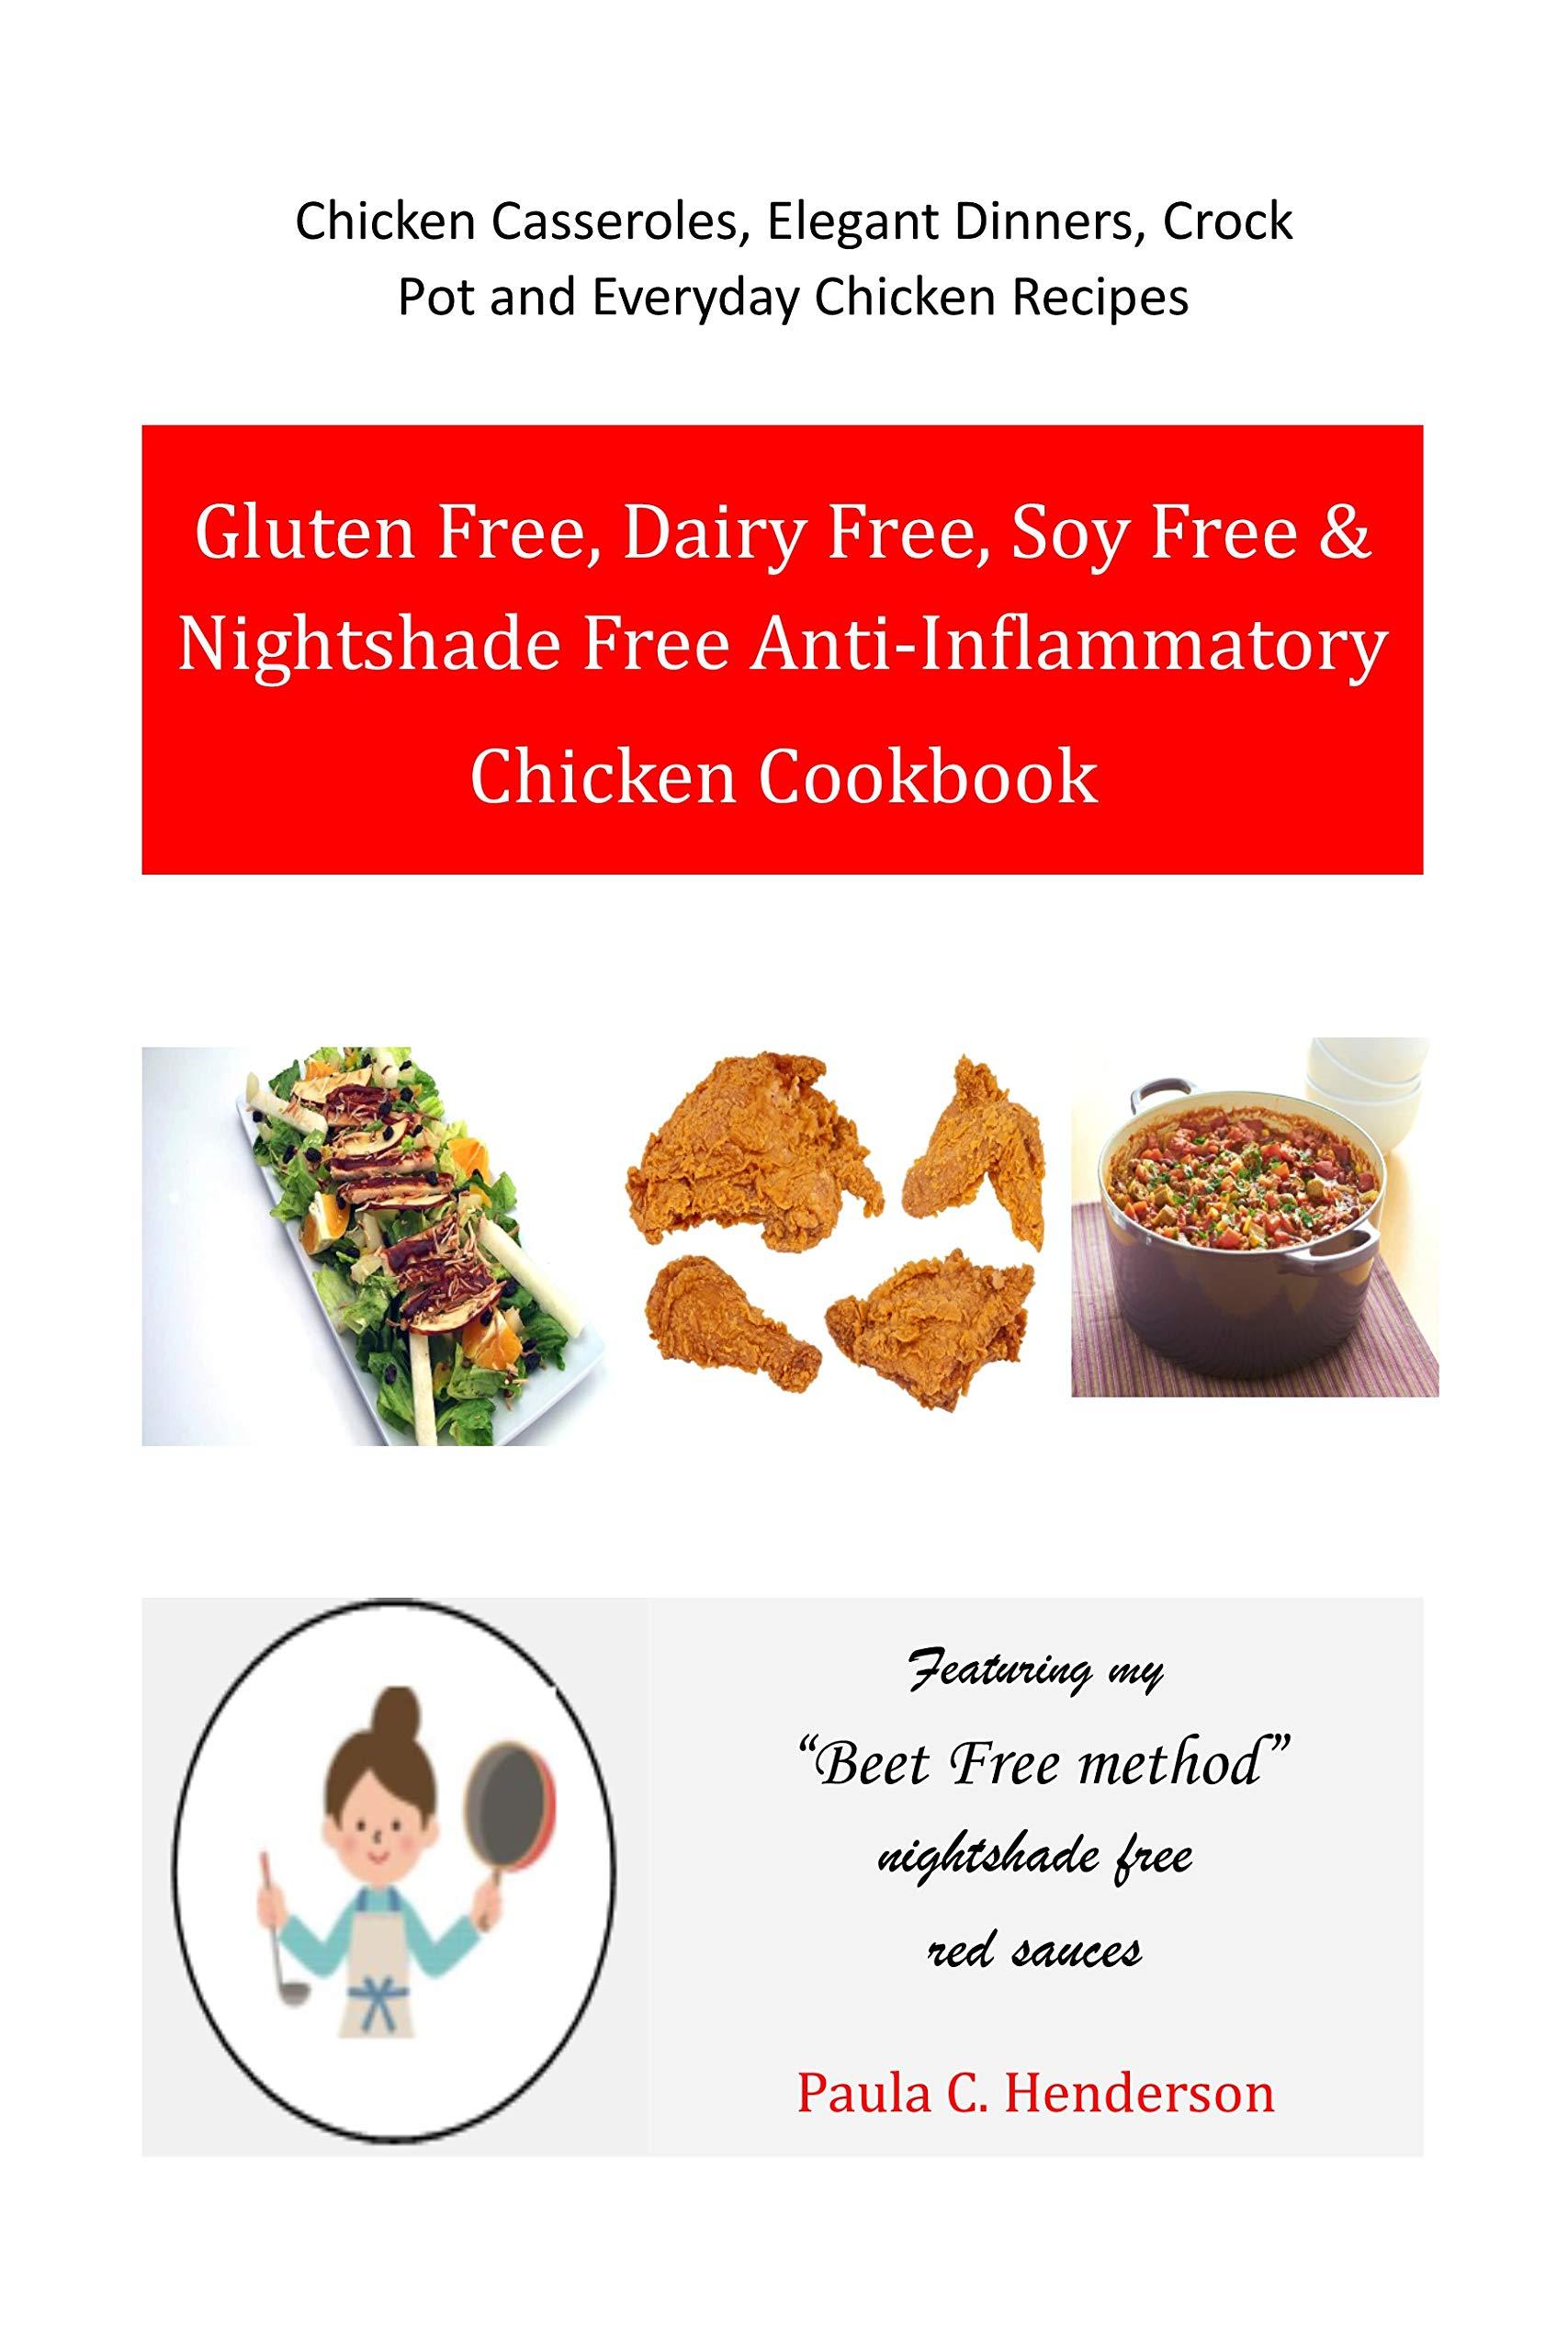 Gluten Free, Dairy Free, Soy Free & Nightshade Free Anti-Inflammatory Chicken Cookbook: Chicken Casseroles, Elegant Dinners, Crock Pot and Everyday Chicken Recipes